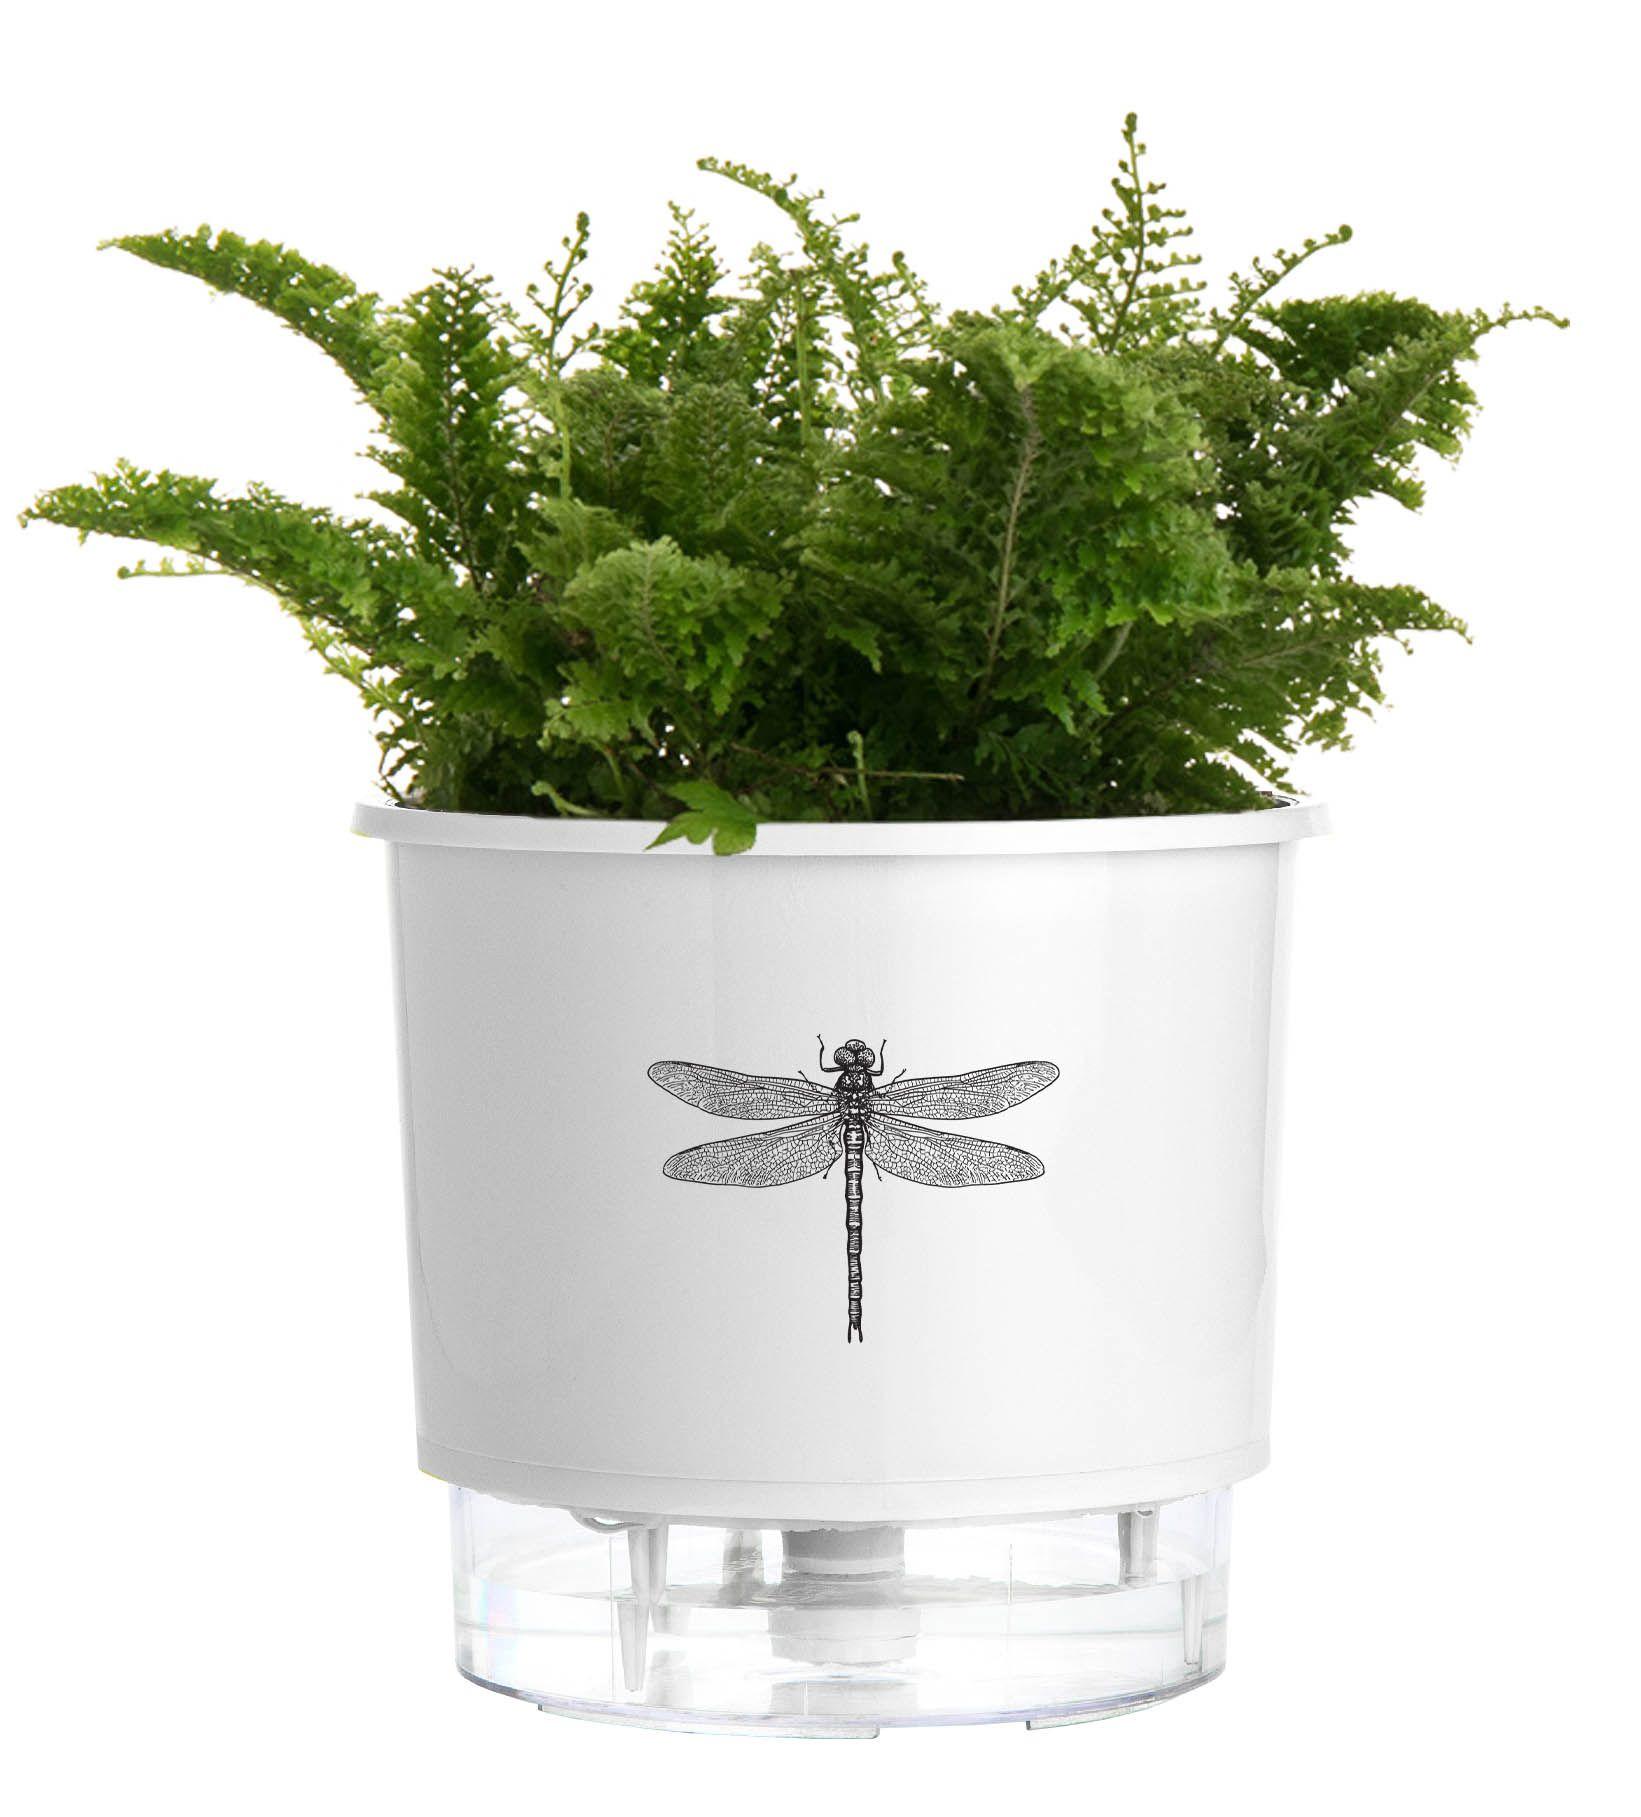 Vaso Autoirrigável Pequeno N02 12cm x 11cm Branco Libélula Coleção Jardim de Insetos  - Vasos Raiz Loja Oficial